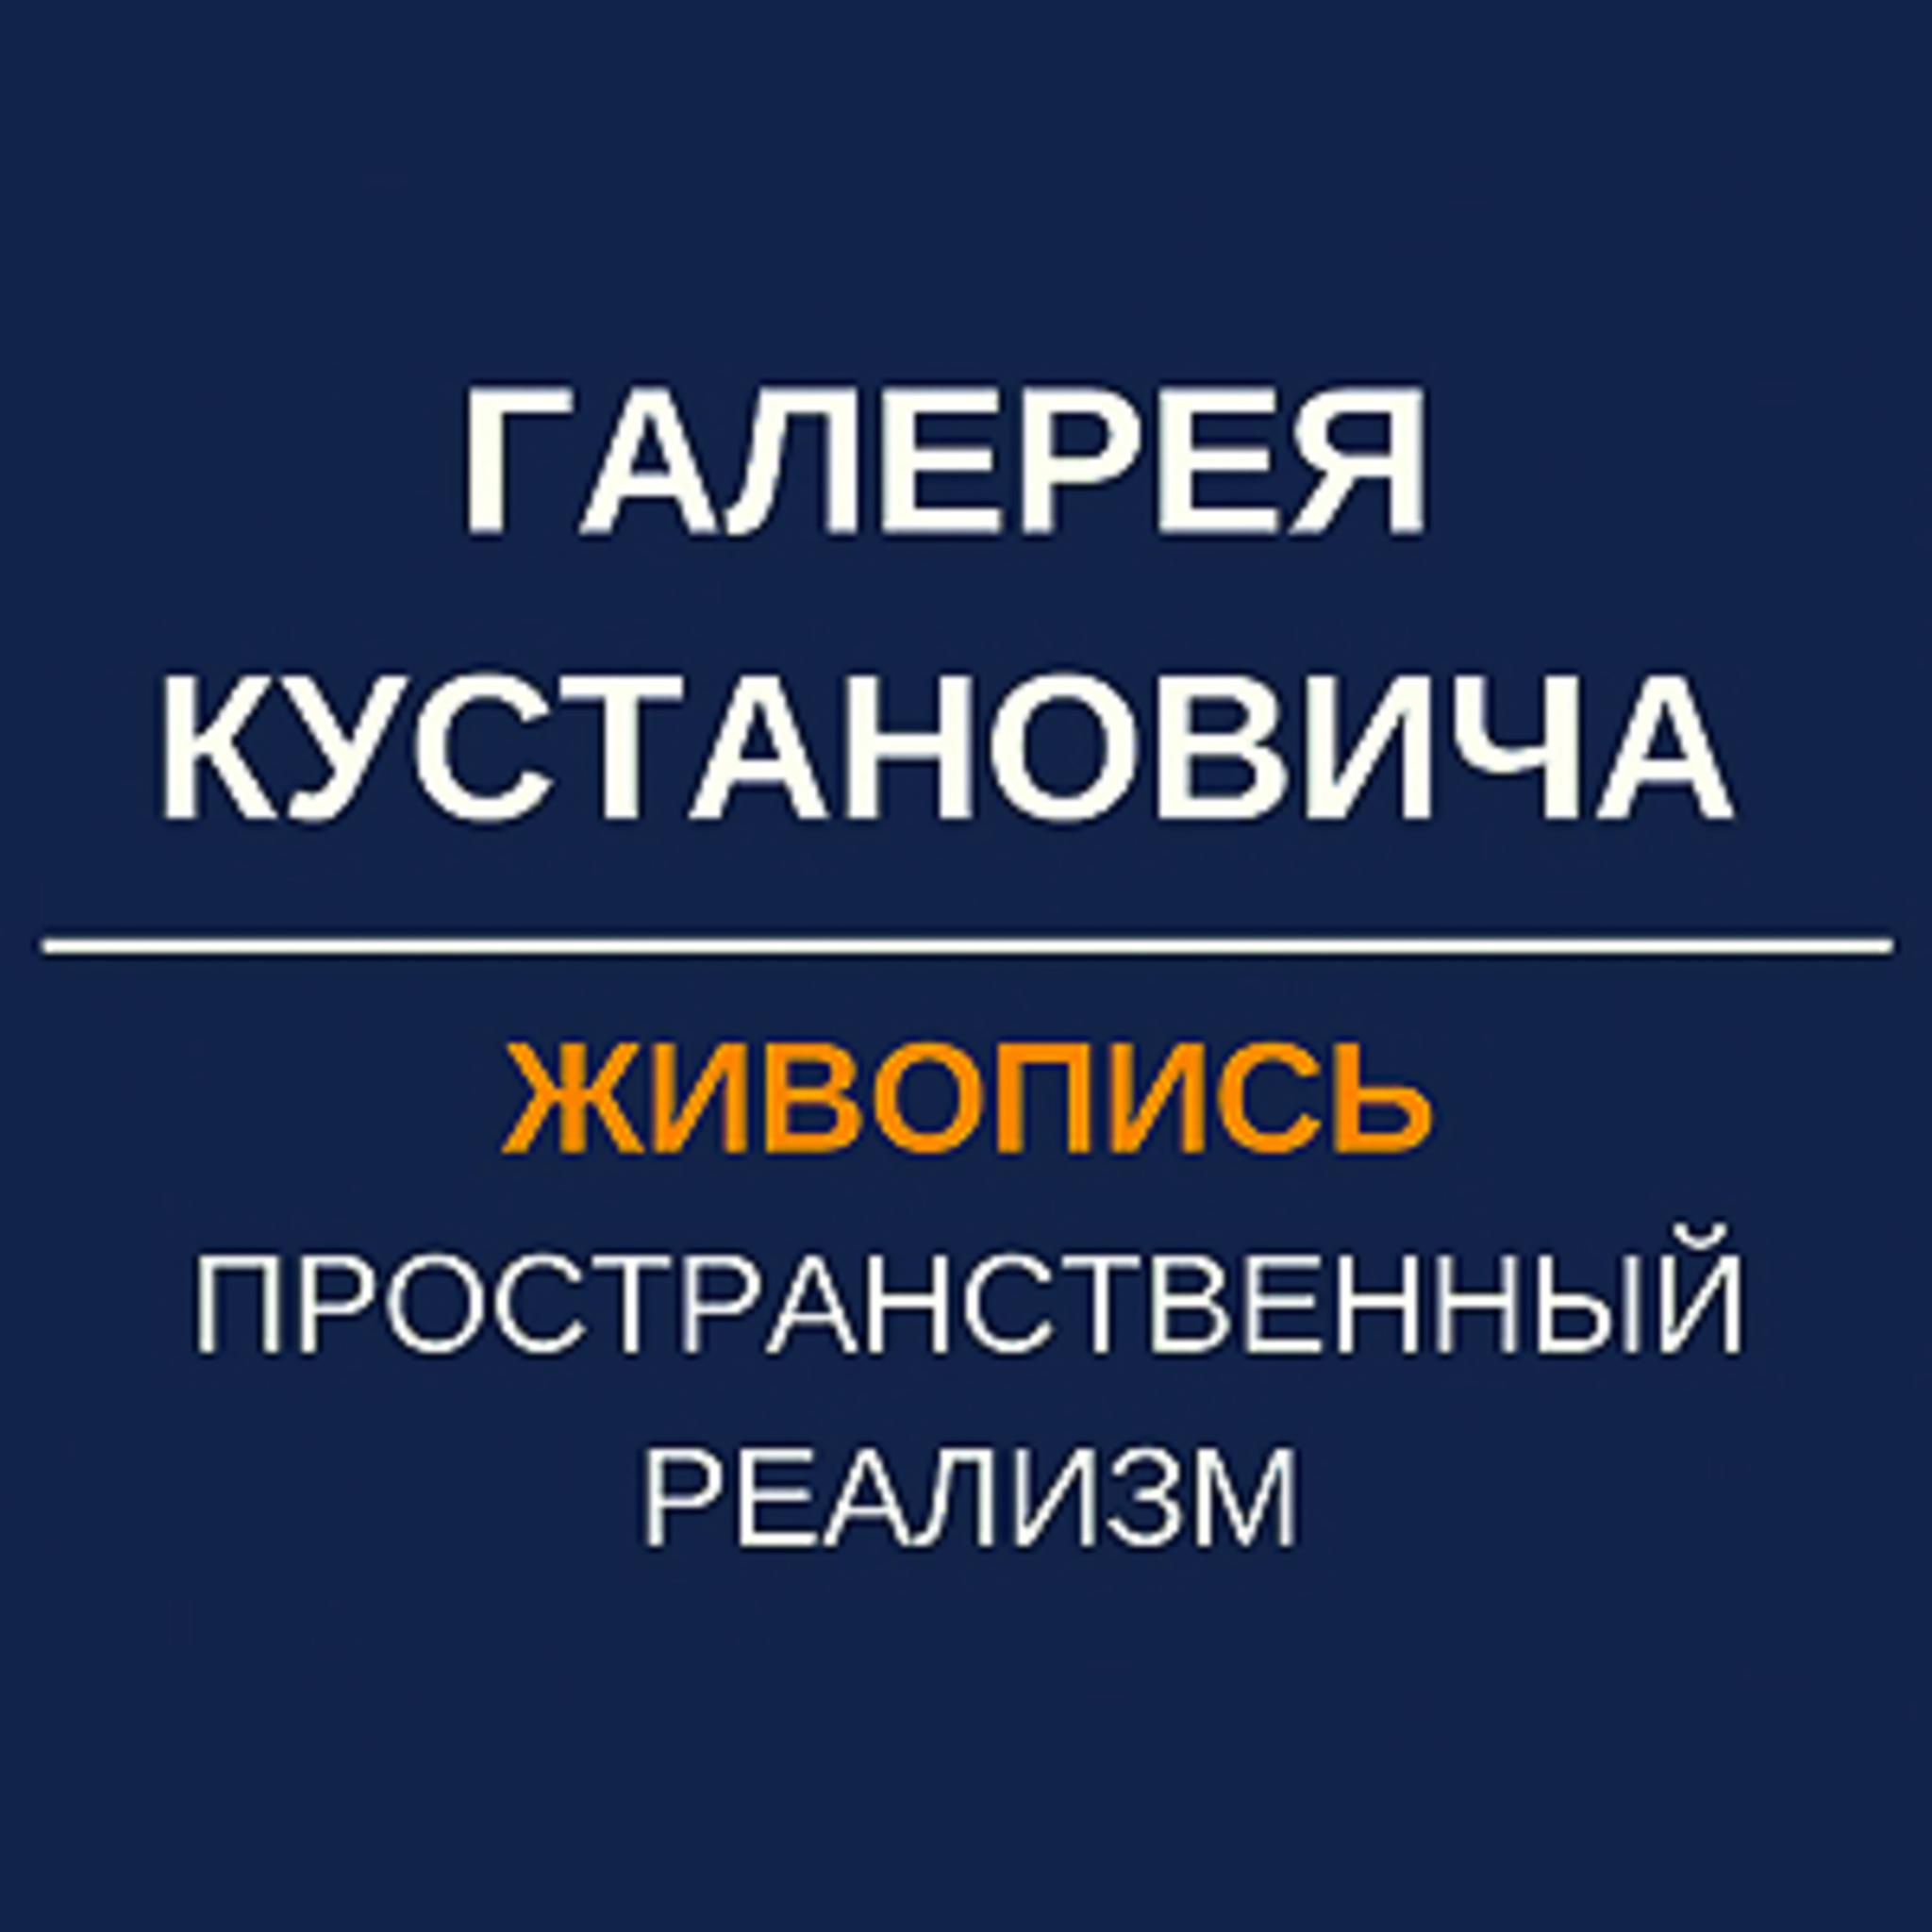 Gallery artist Dmitry Kustanovich